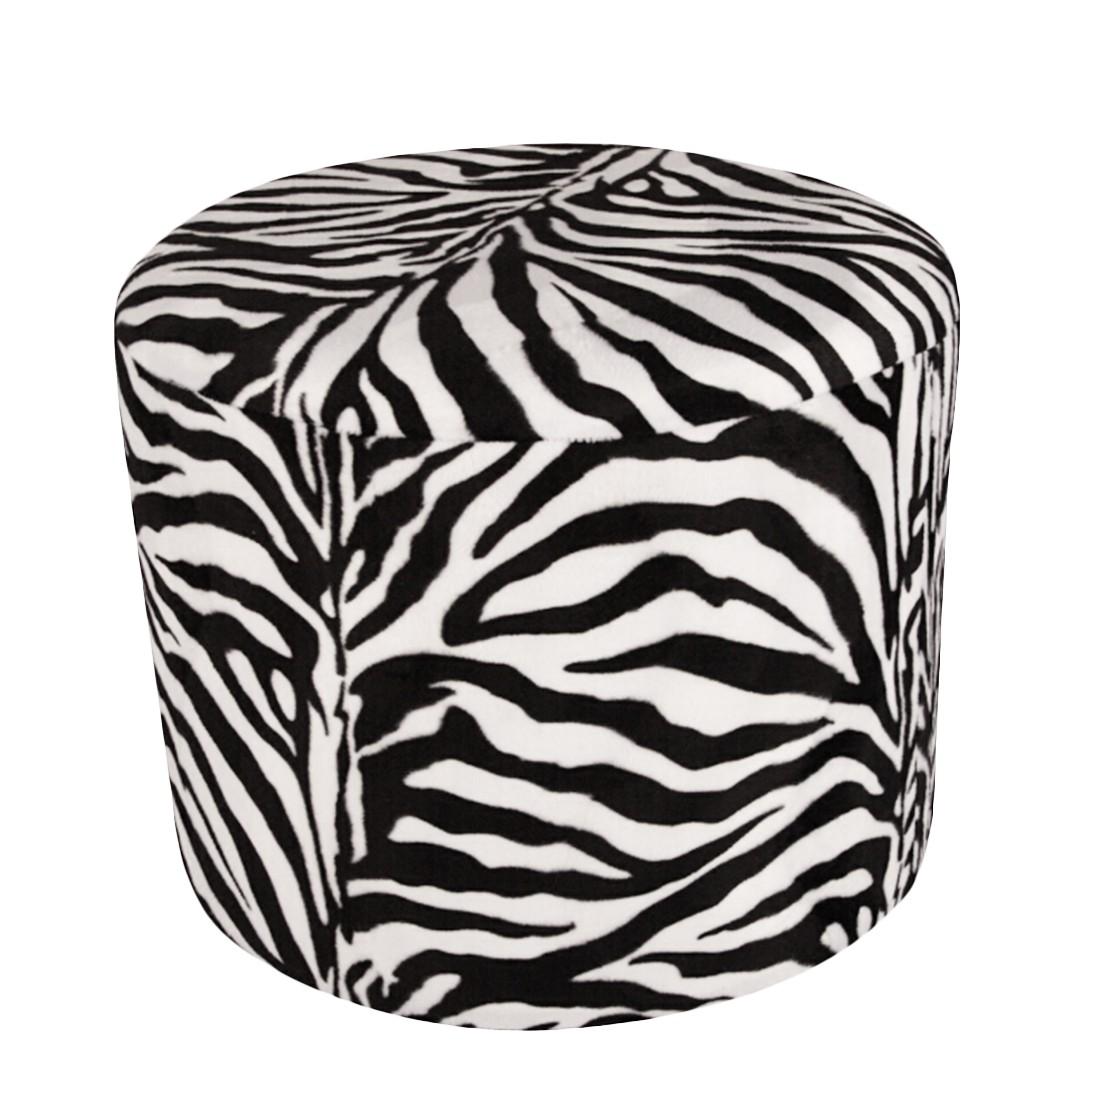 Möbelhocker Zebra Rund – 50 x 50 cm, KC-Handel günstig